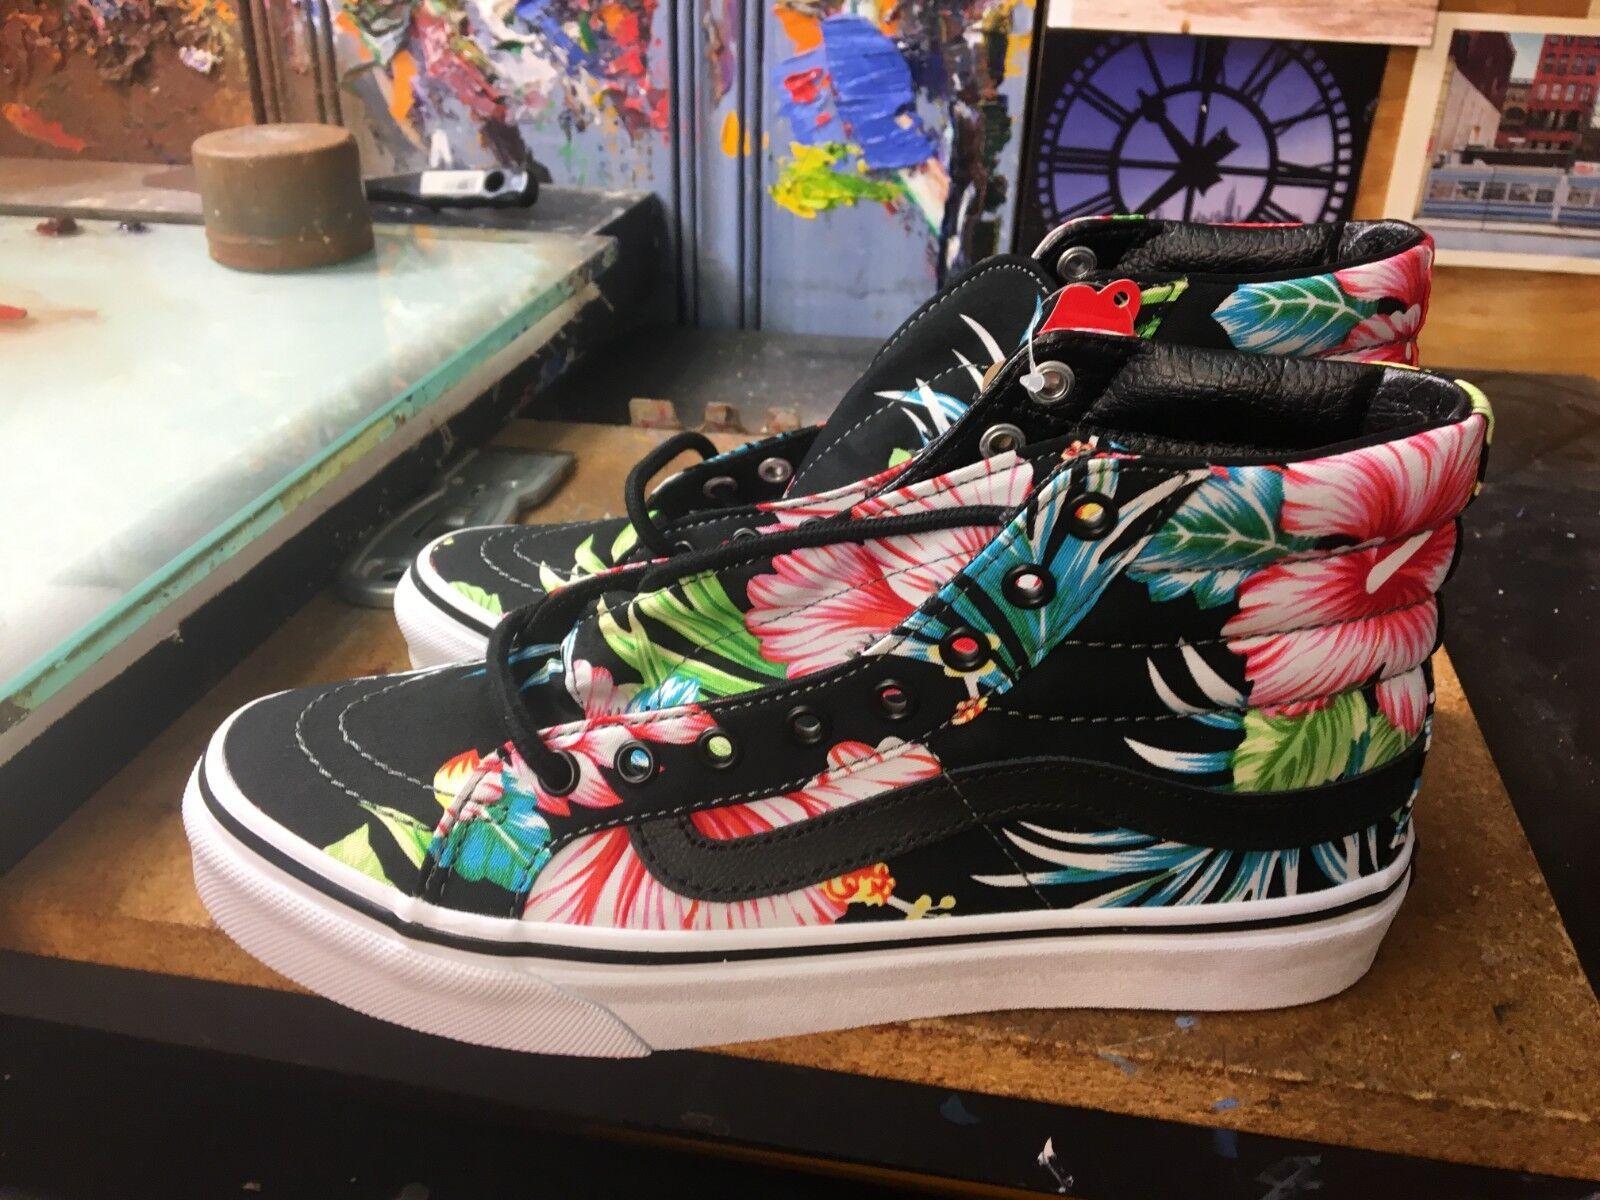 Vans SK8-Hi Slim (Hawaiian Floral) Floral) Floral) nero Dimensione US 4 Uomo (5.5 donna) VN000XH7FFZ e361fc